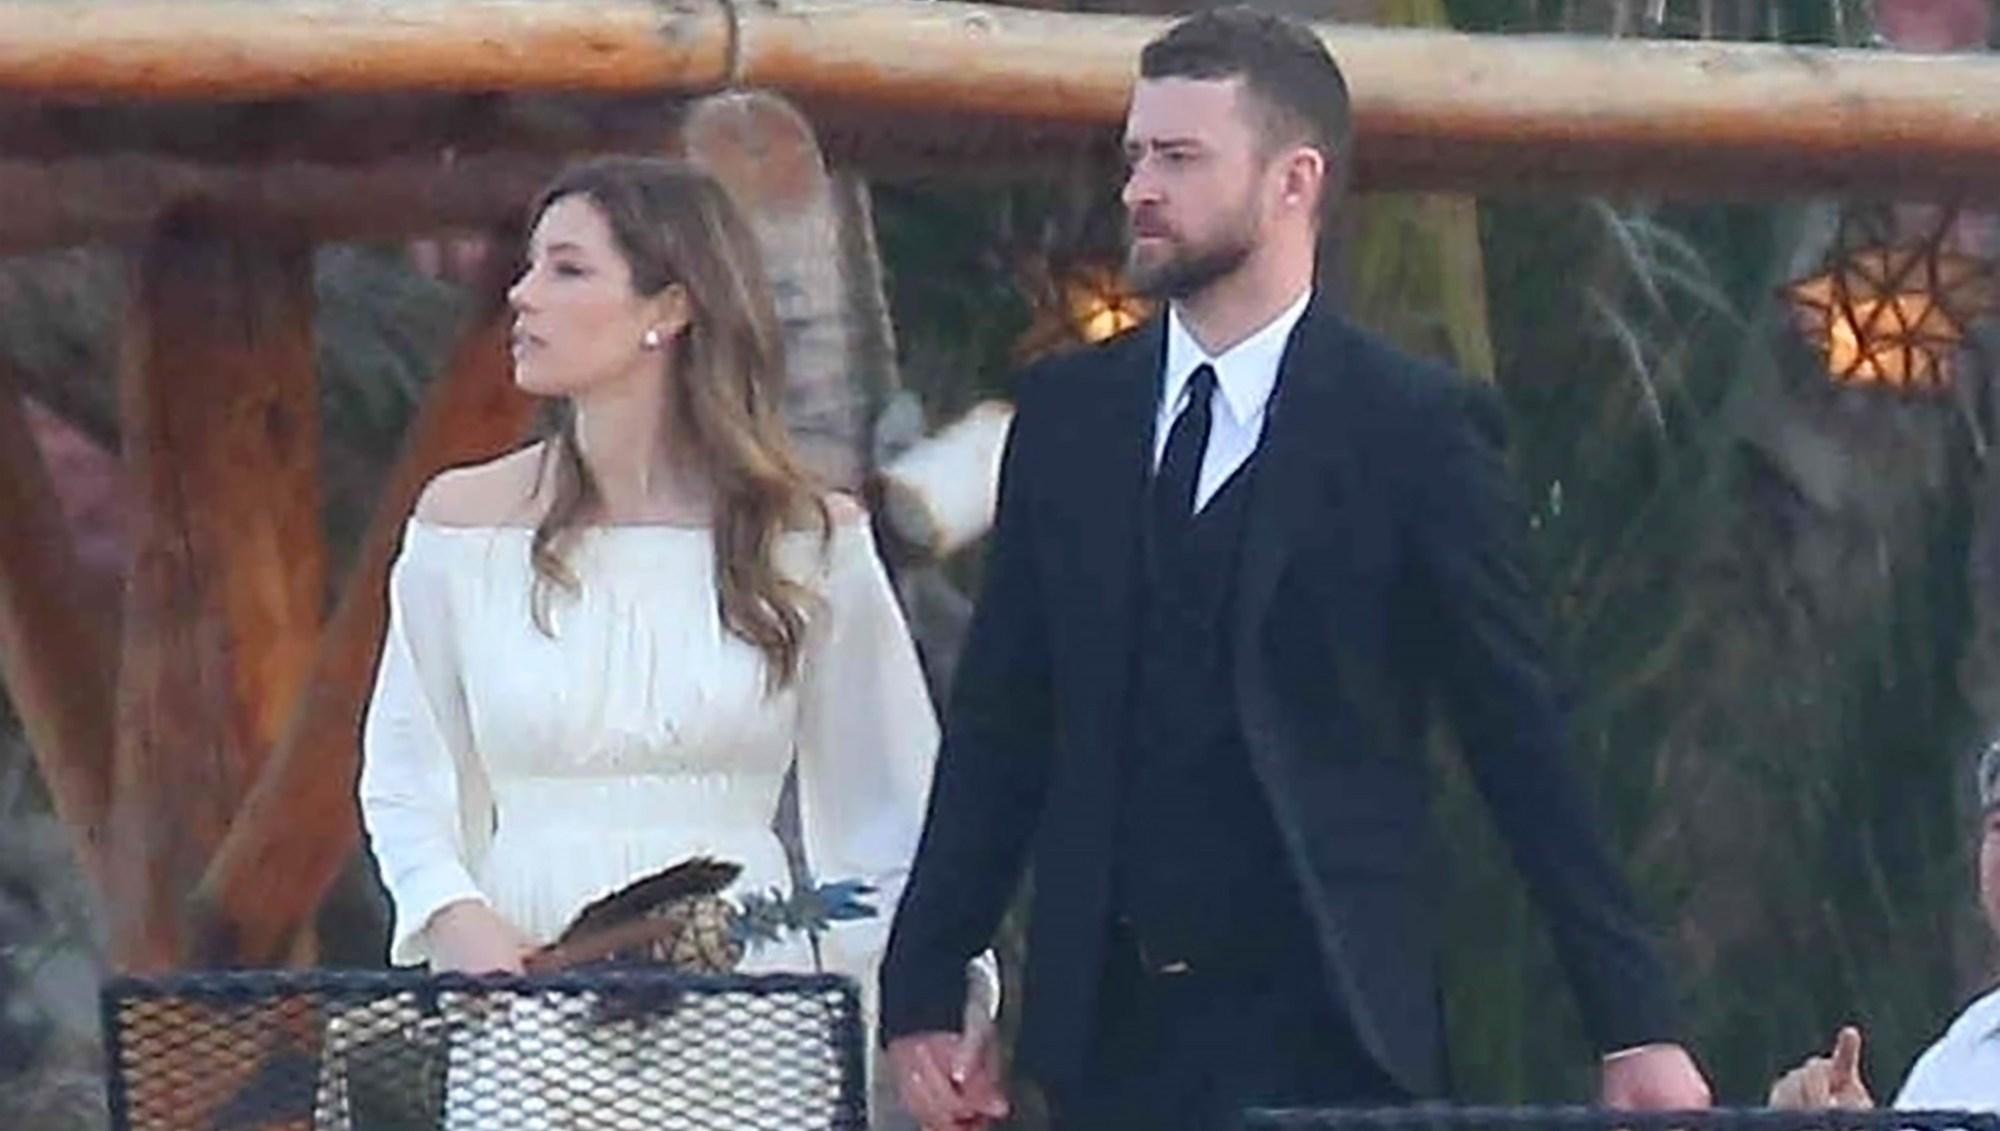 Justin Timberlake, Jessica Biel, Brother, Wedding, Cabo San Lucas, Mexico